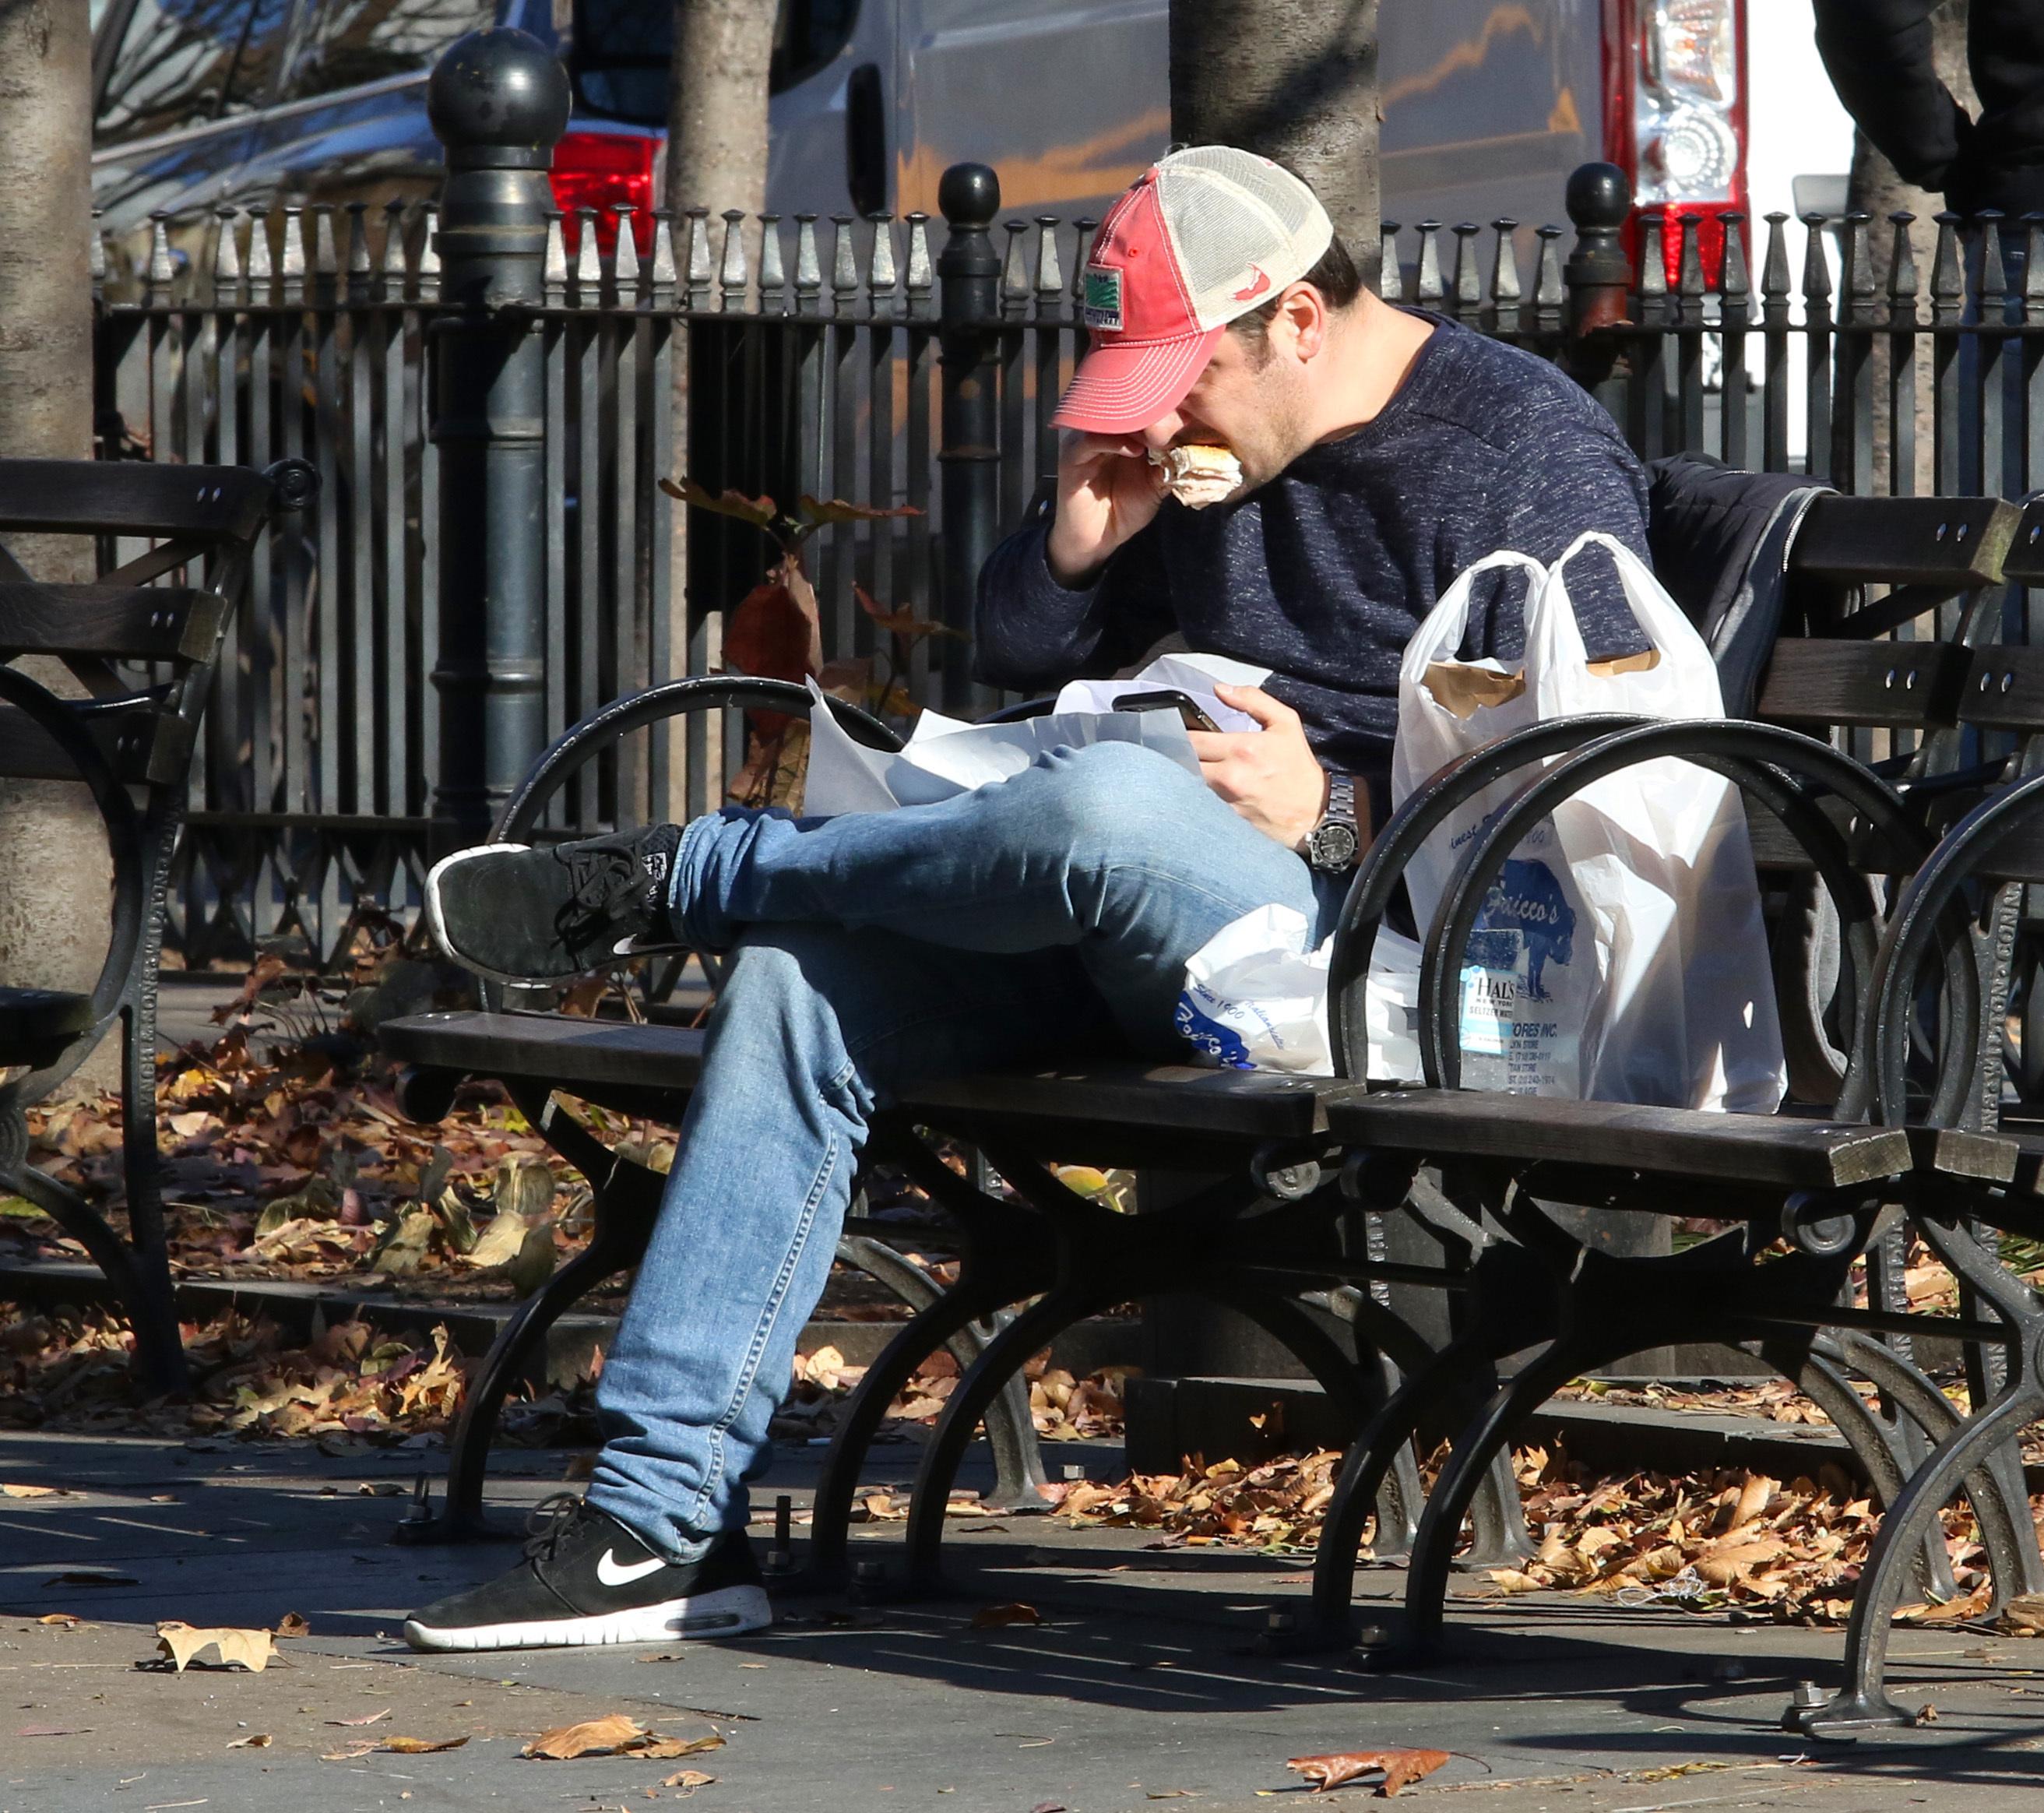 Jason Biggs enjoys eating a sandwich on a park bench in Manhattan's West Village Neighborhood in New York City on Nov. 29, 2017.